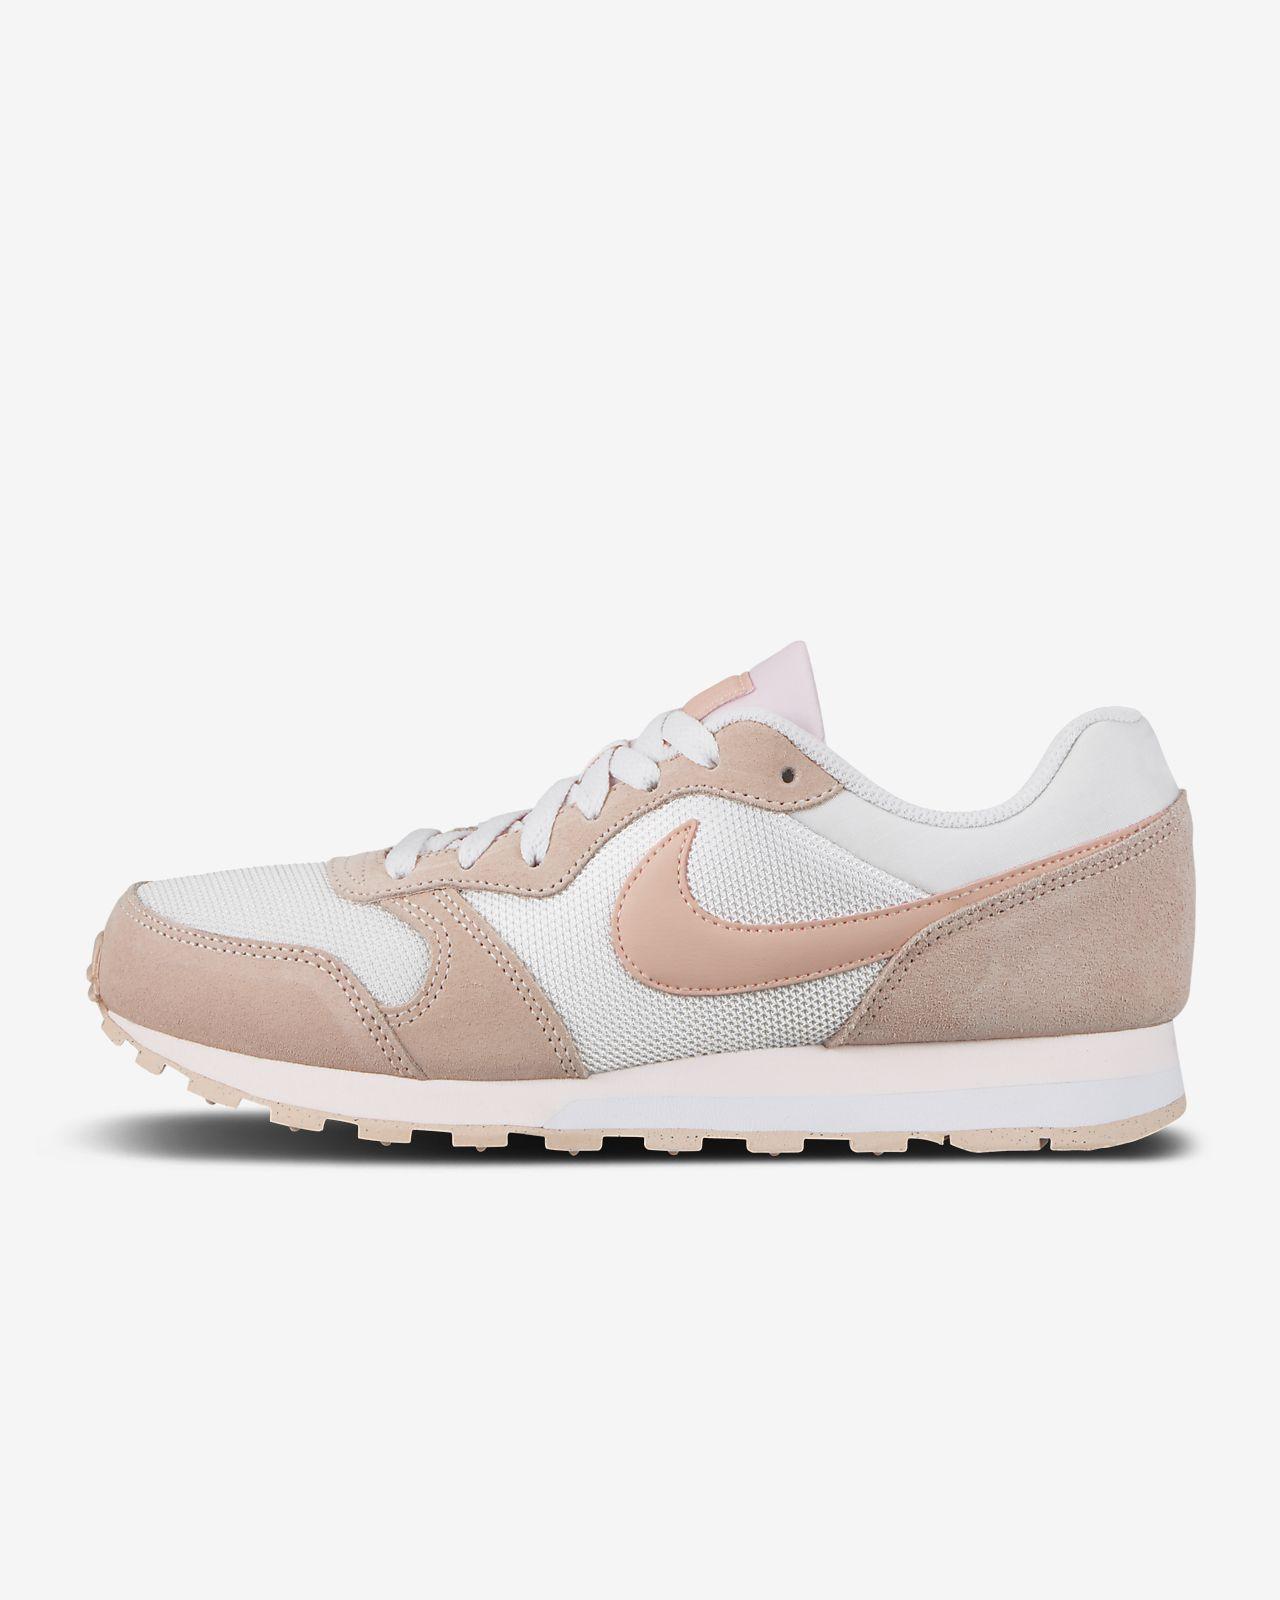 Nike MD Runner 2 Women's Shoe